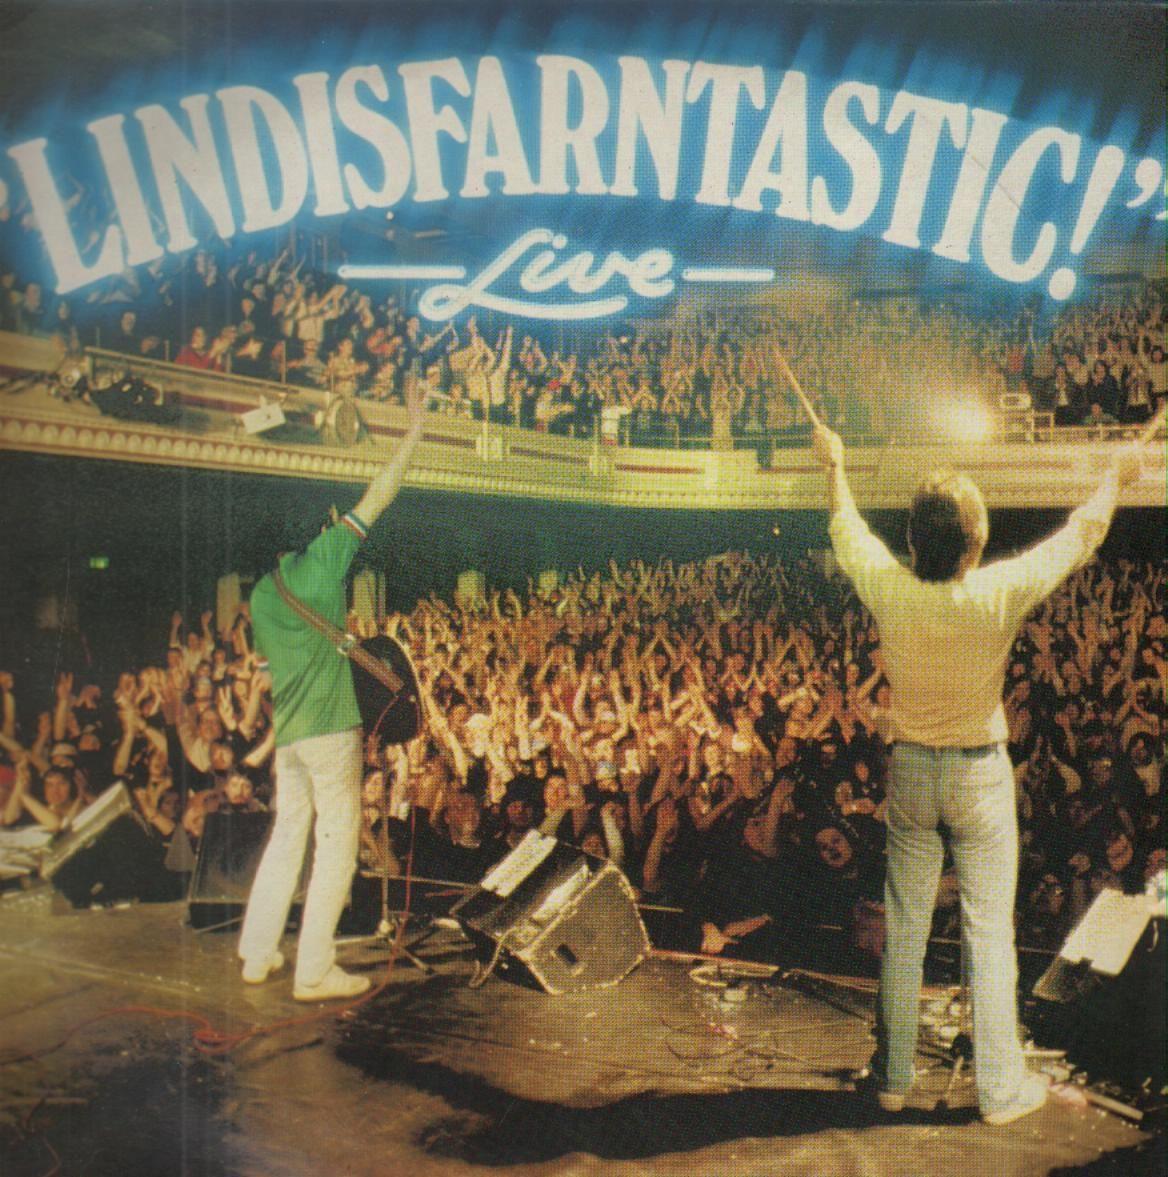 Lindisfarne Lindisfarntastic! Live Vinyl